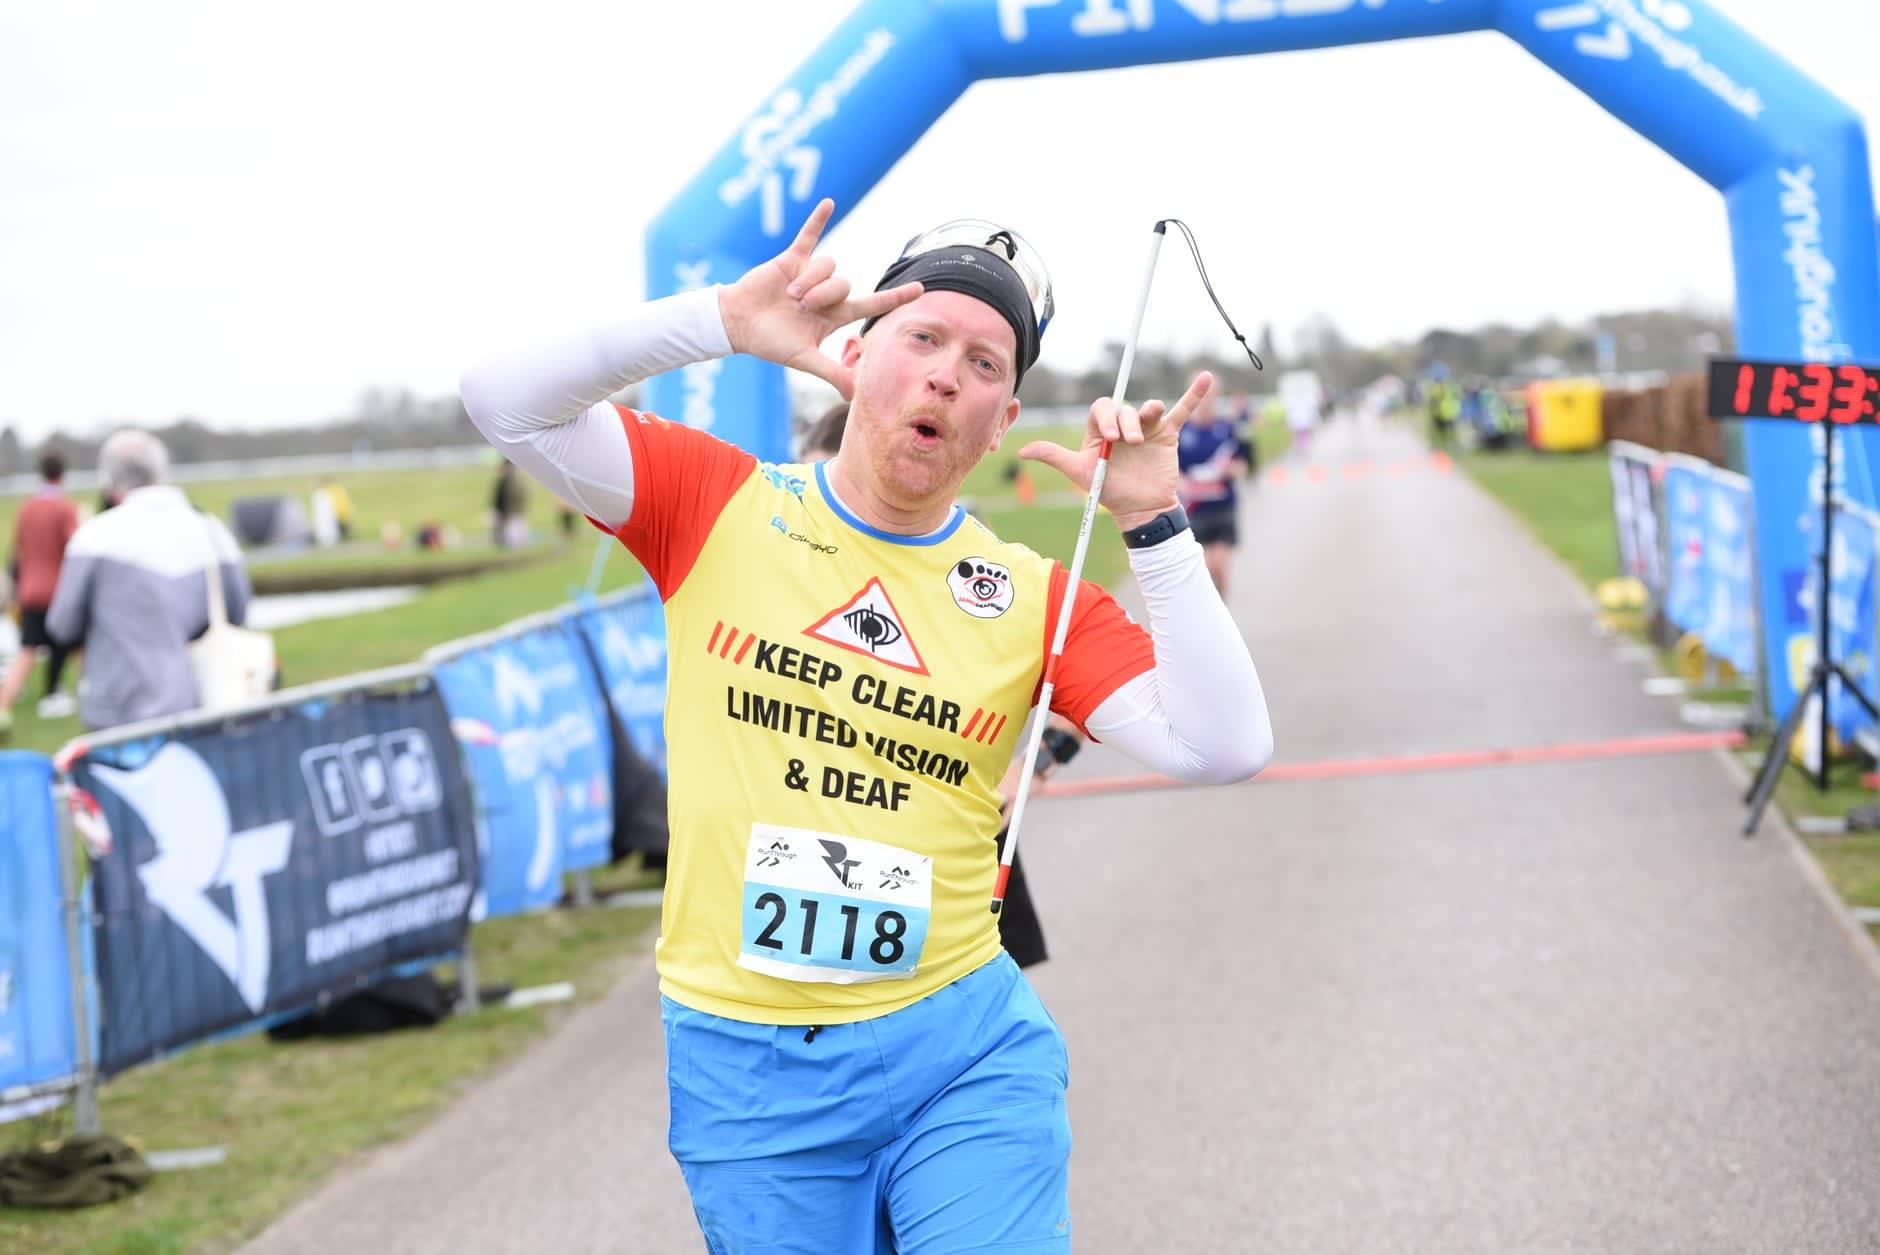 Kempton Park 5k, 10k & Half Marathon - August